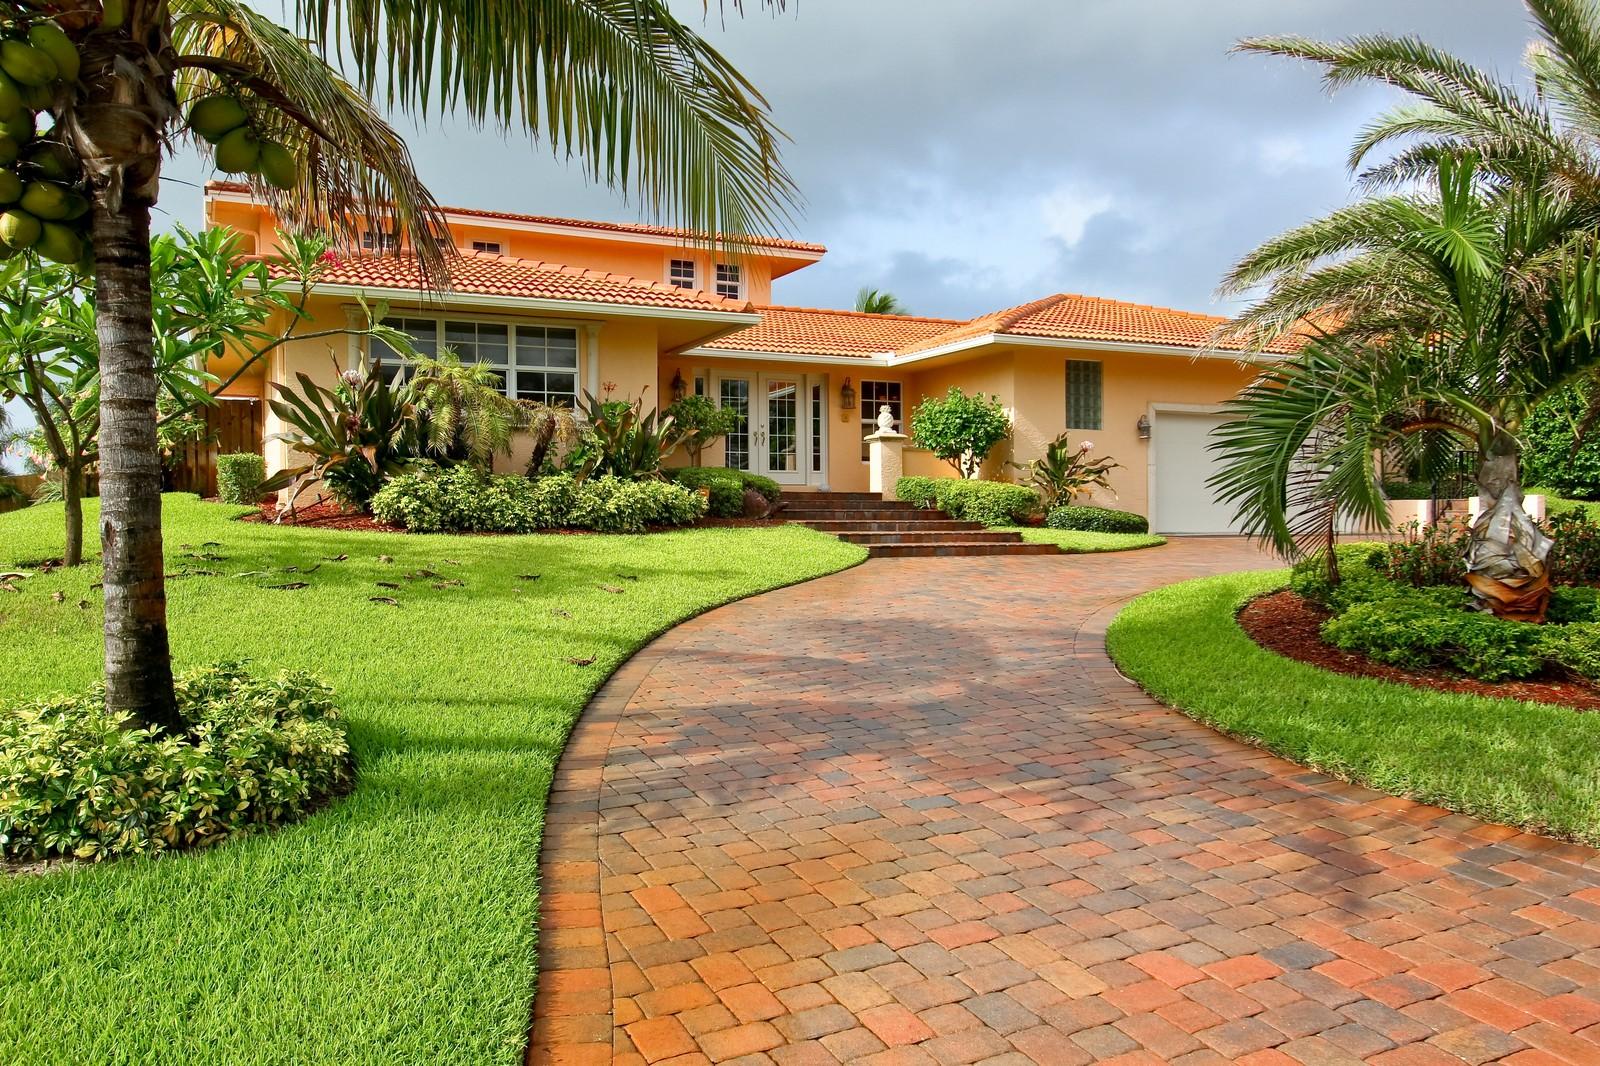 Real Estate Photography - 430 N. Lyra Circle, Juno Beach, FL, 33408 - Front View